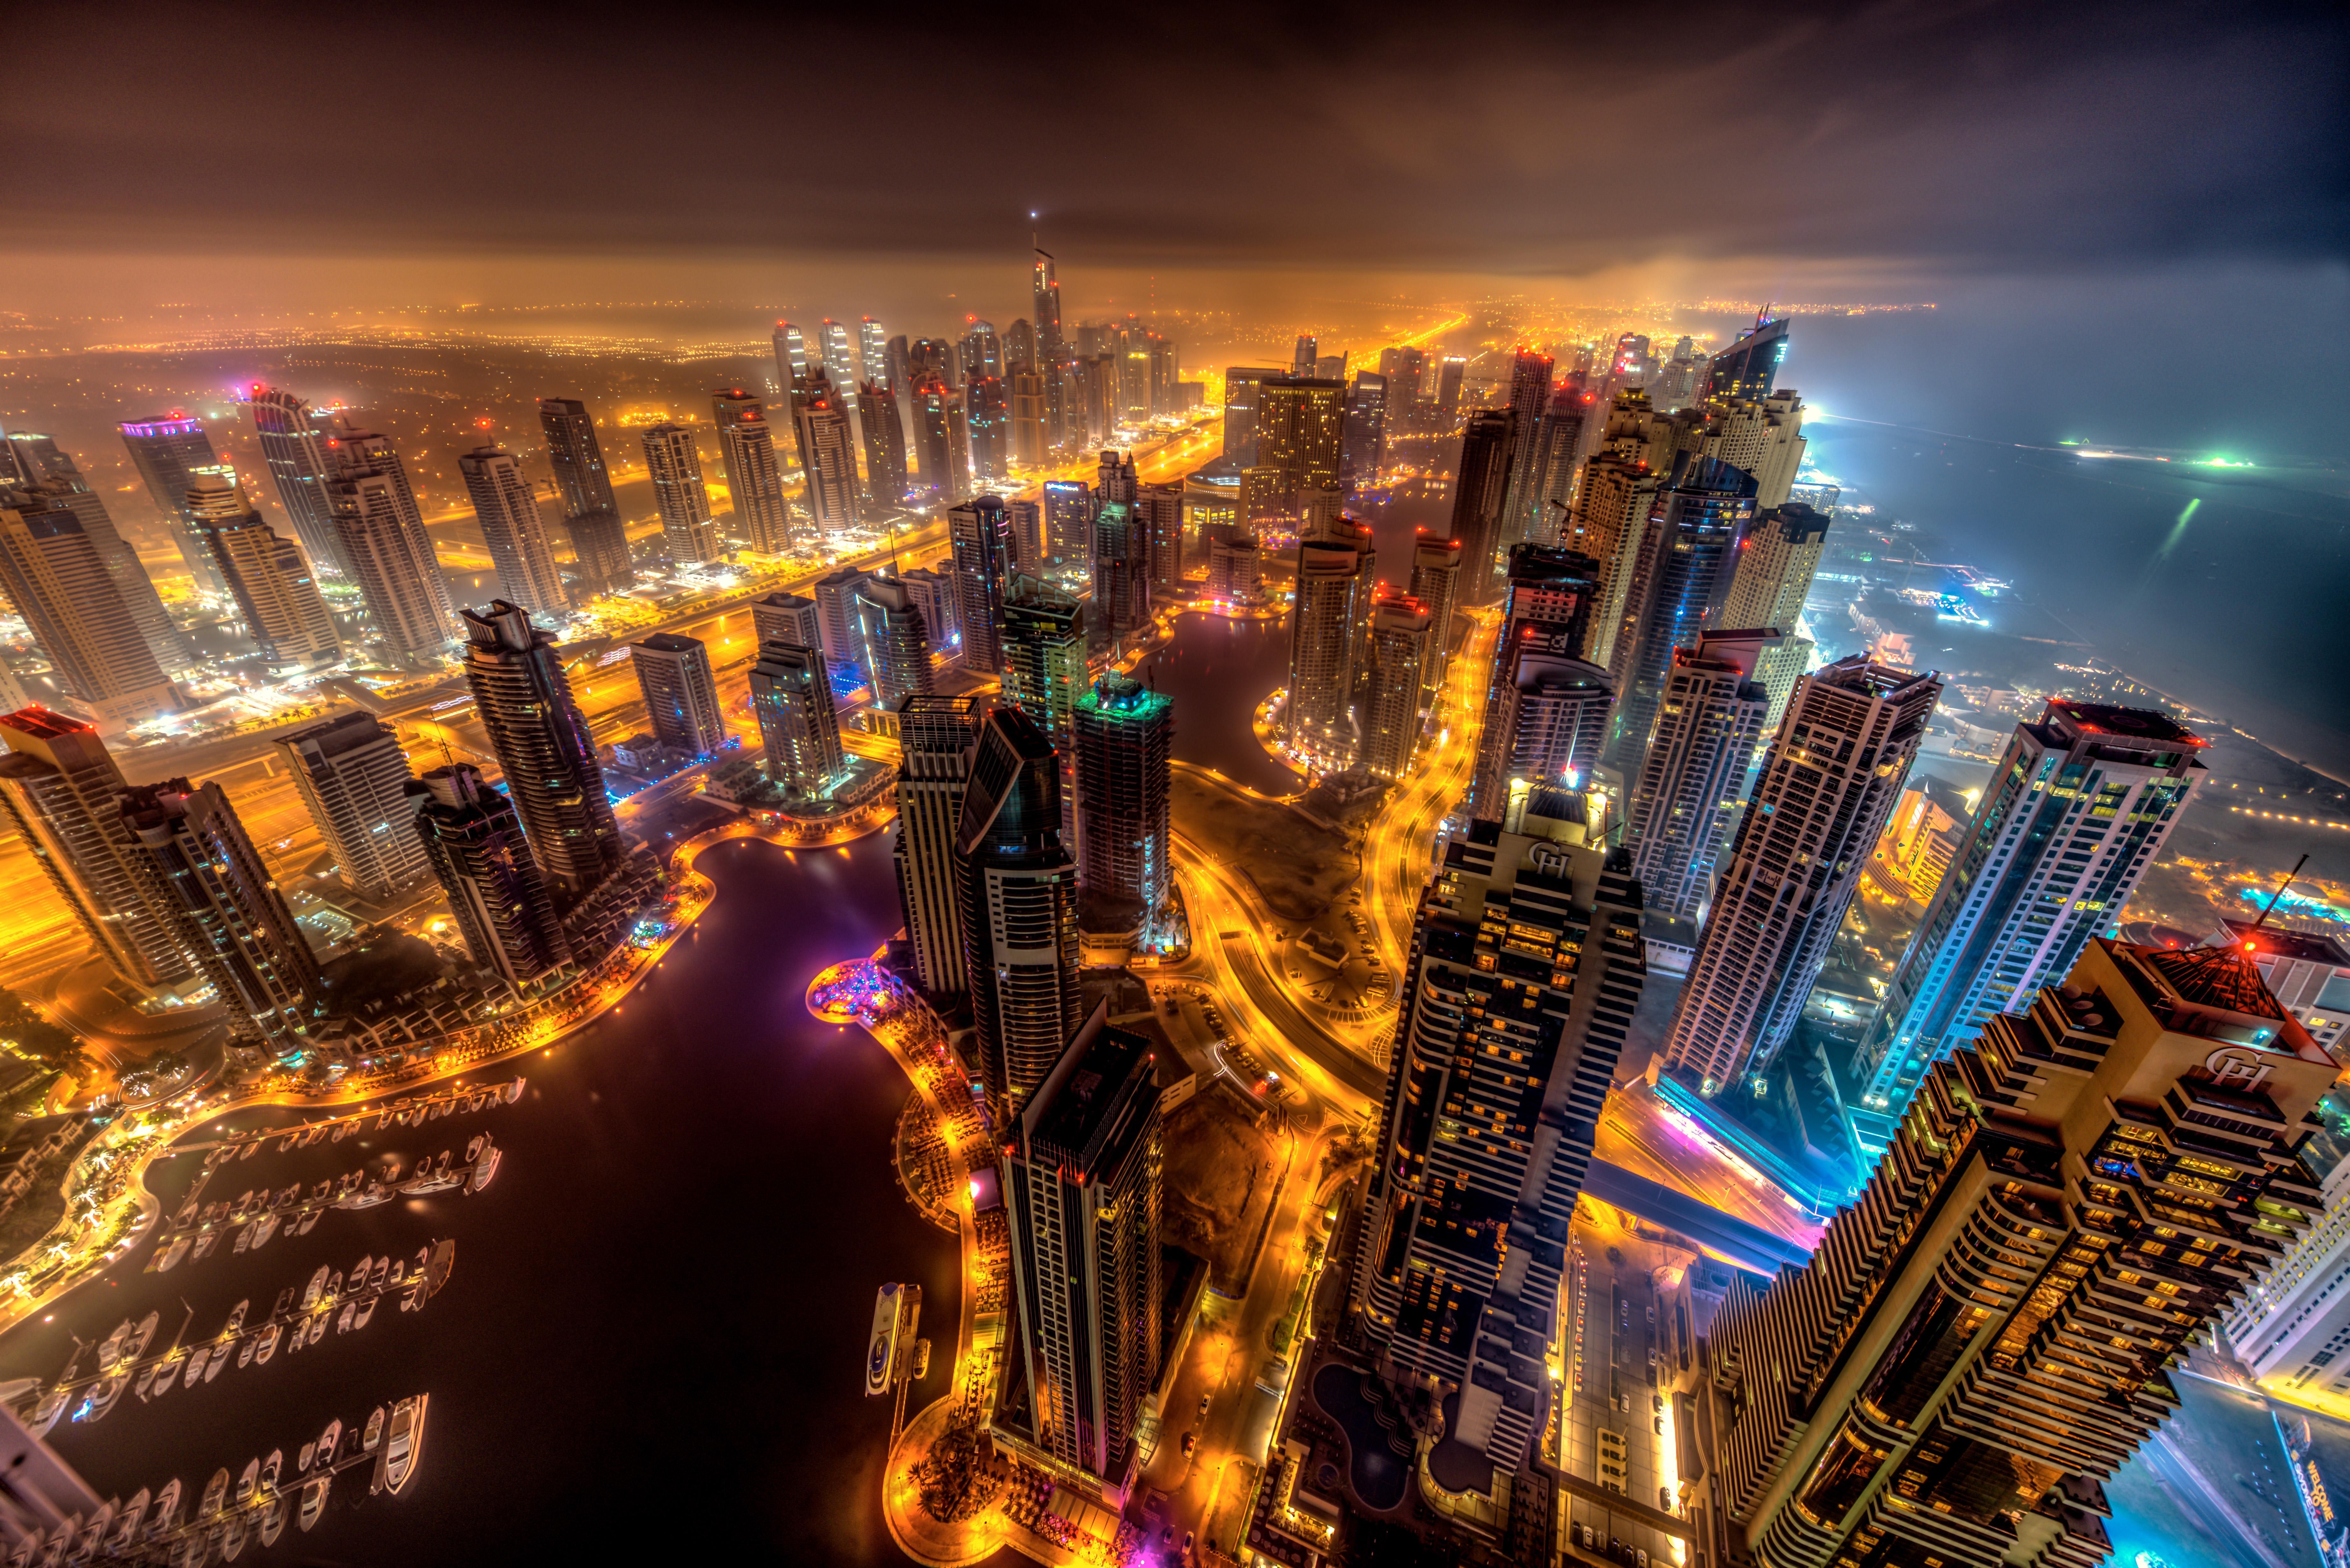 Dubai Buildings Night Lights Top View 8k Hd World 4k